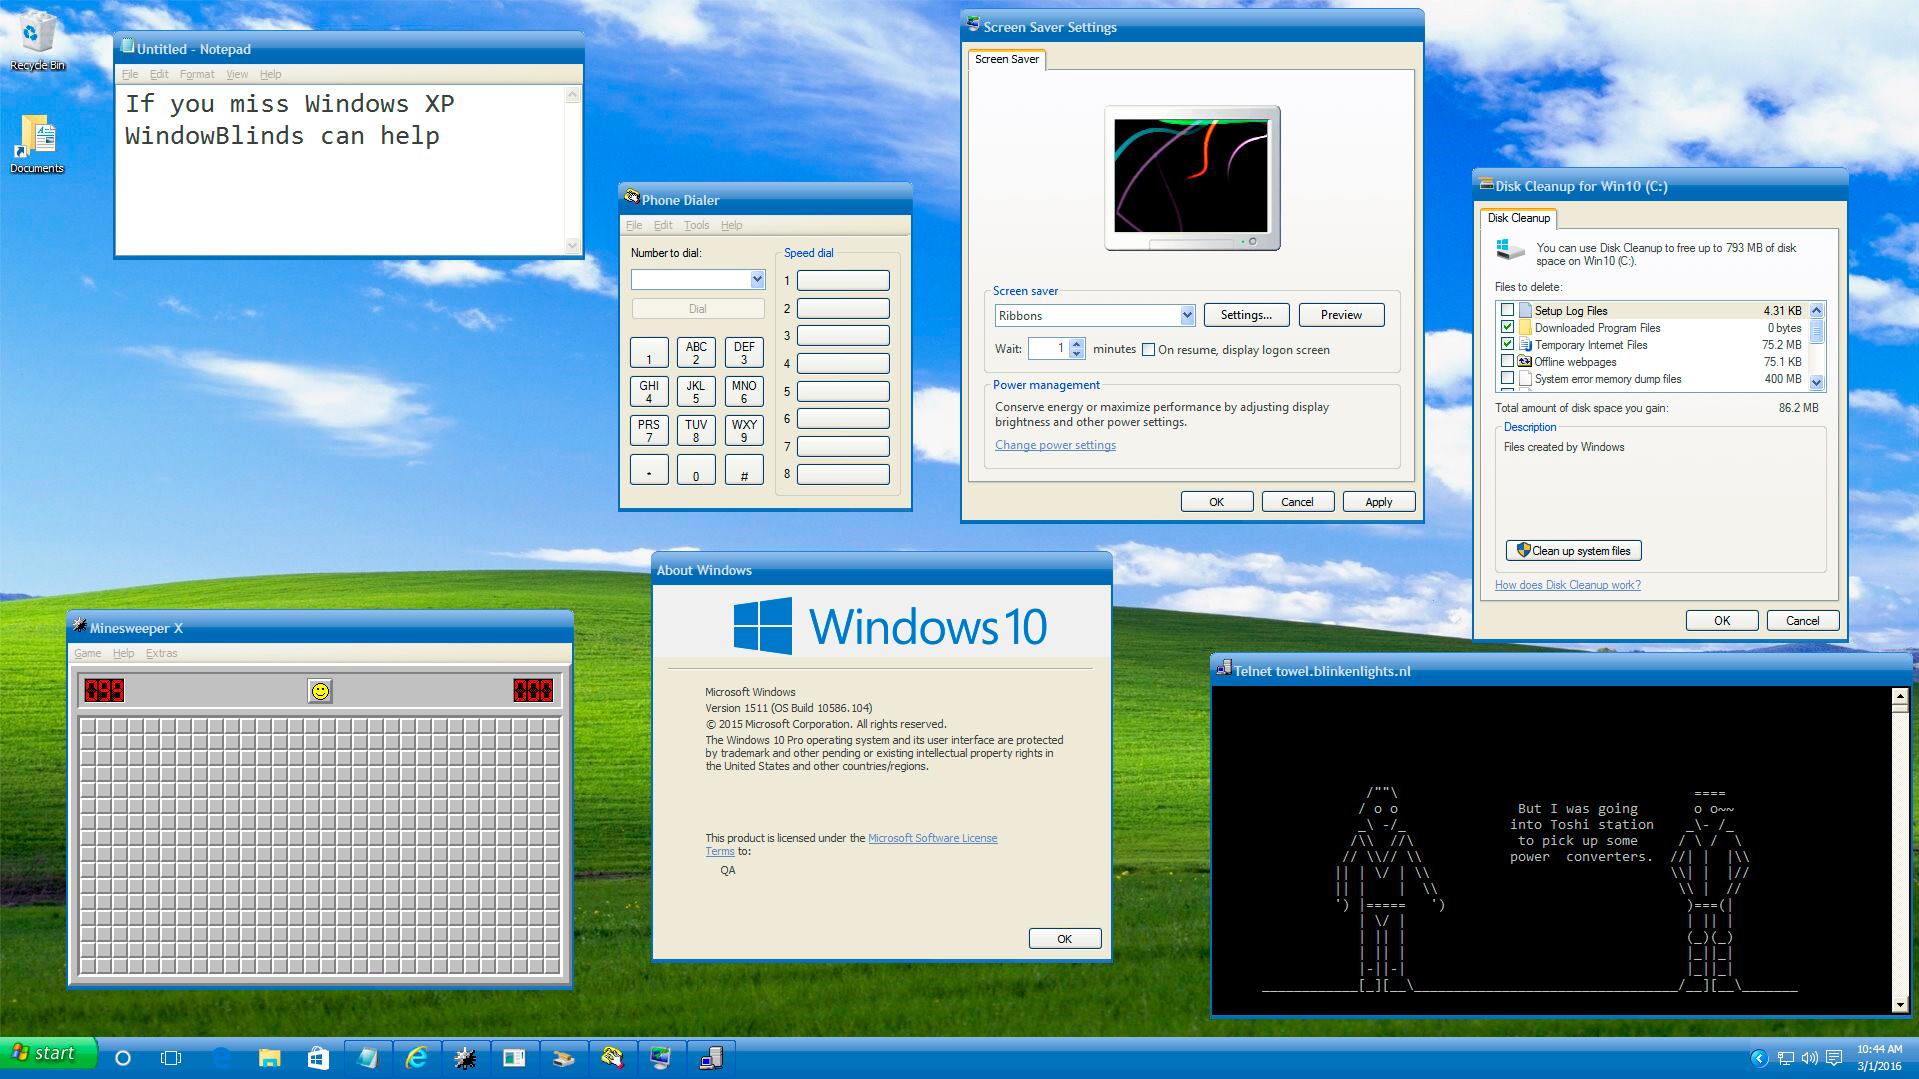 WindowBlinds Software from Stardock Corporation